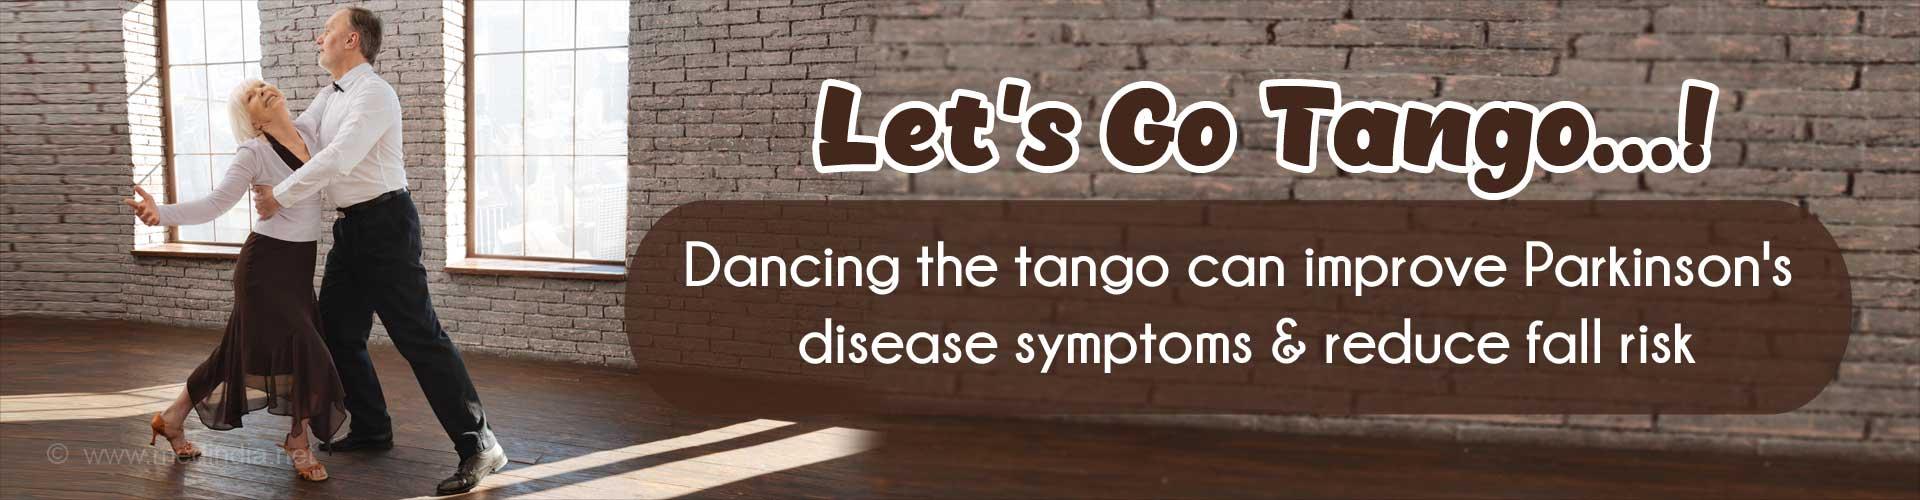 Tango Dancing can Improve Parkinson''s Disease Symptoms, Reduce Fall Risk